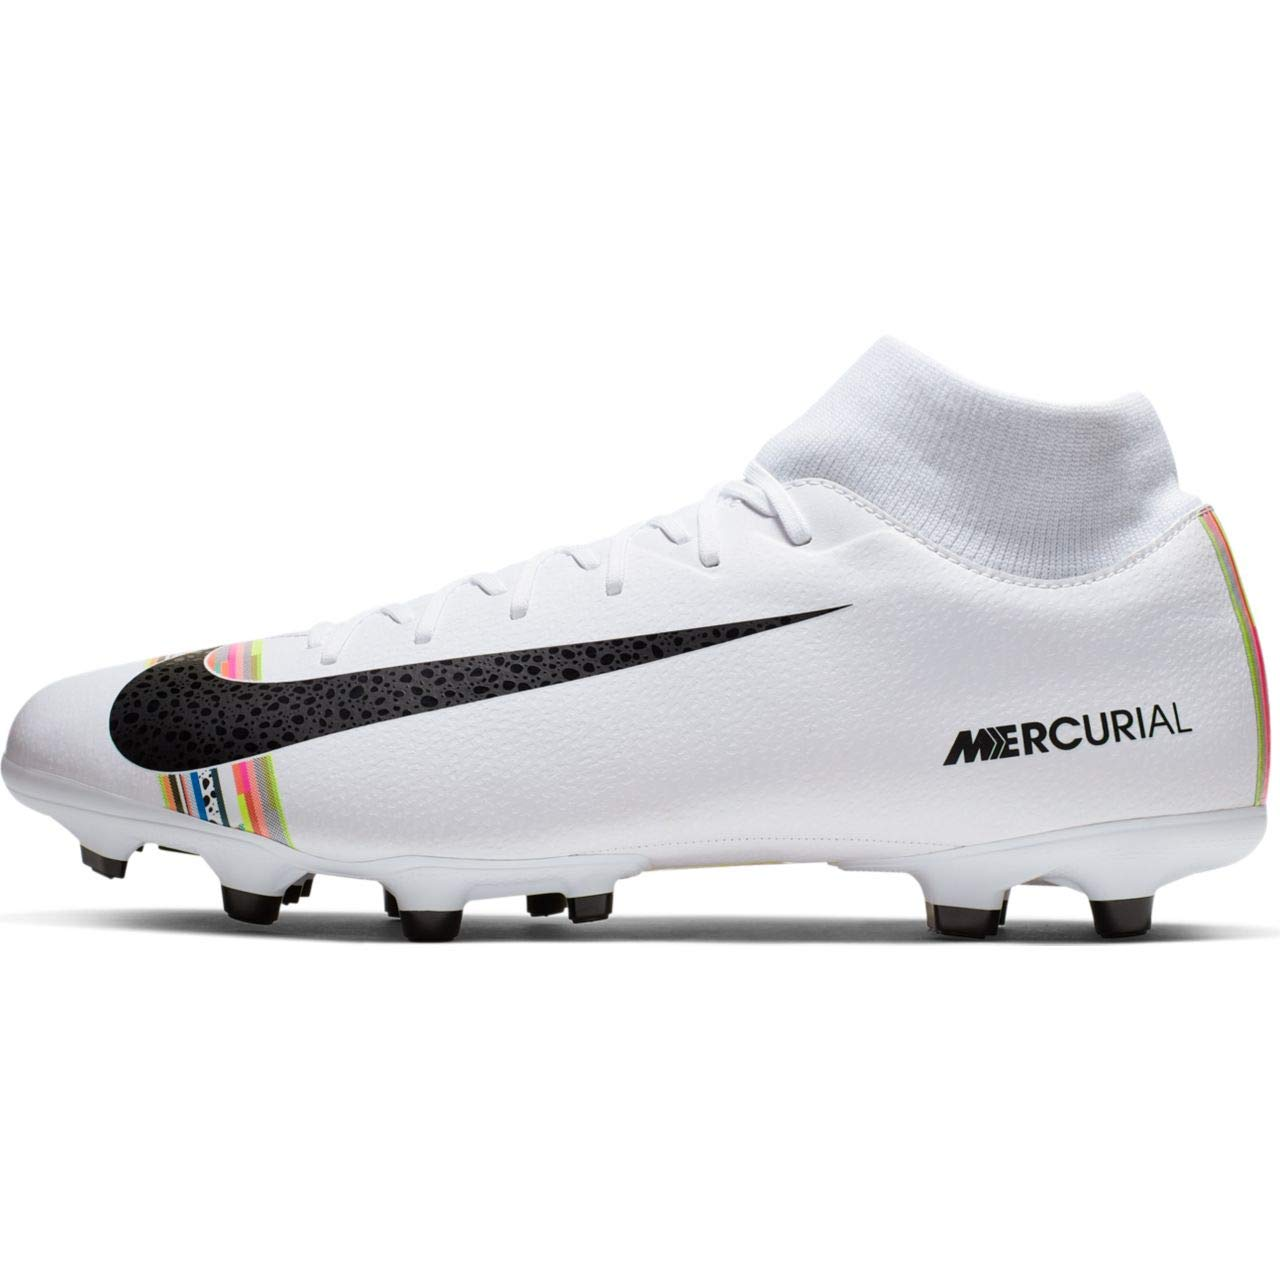 pretty nice c5631 9eb1c cr7 soccer cleats black